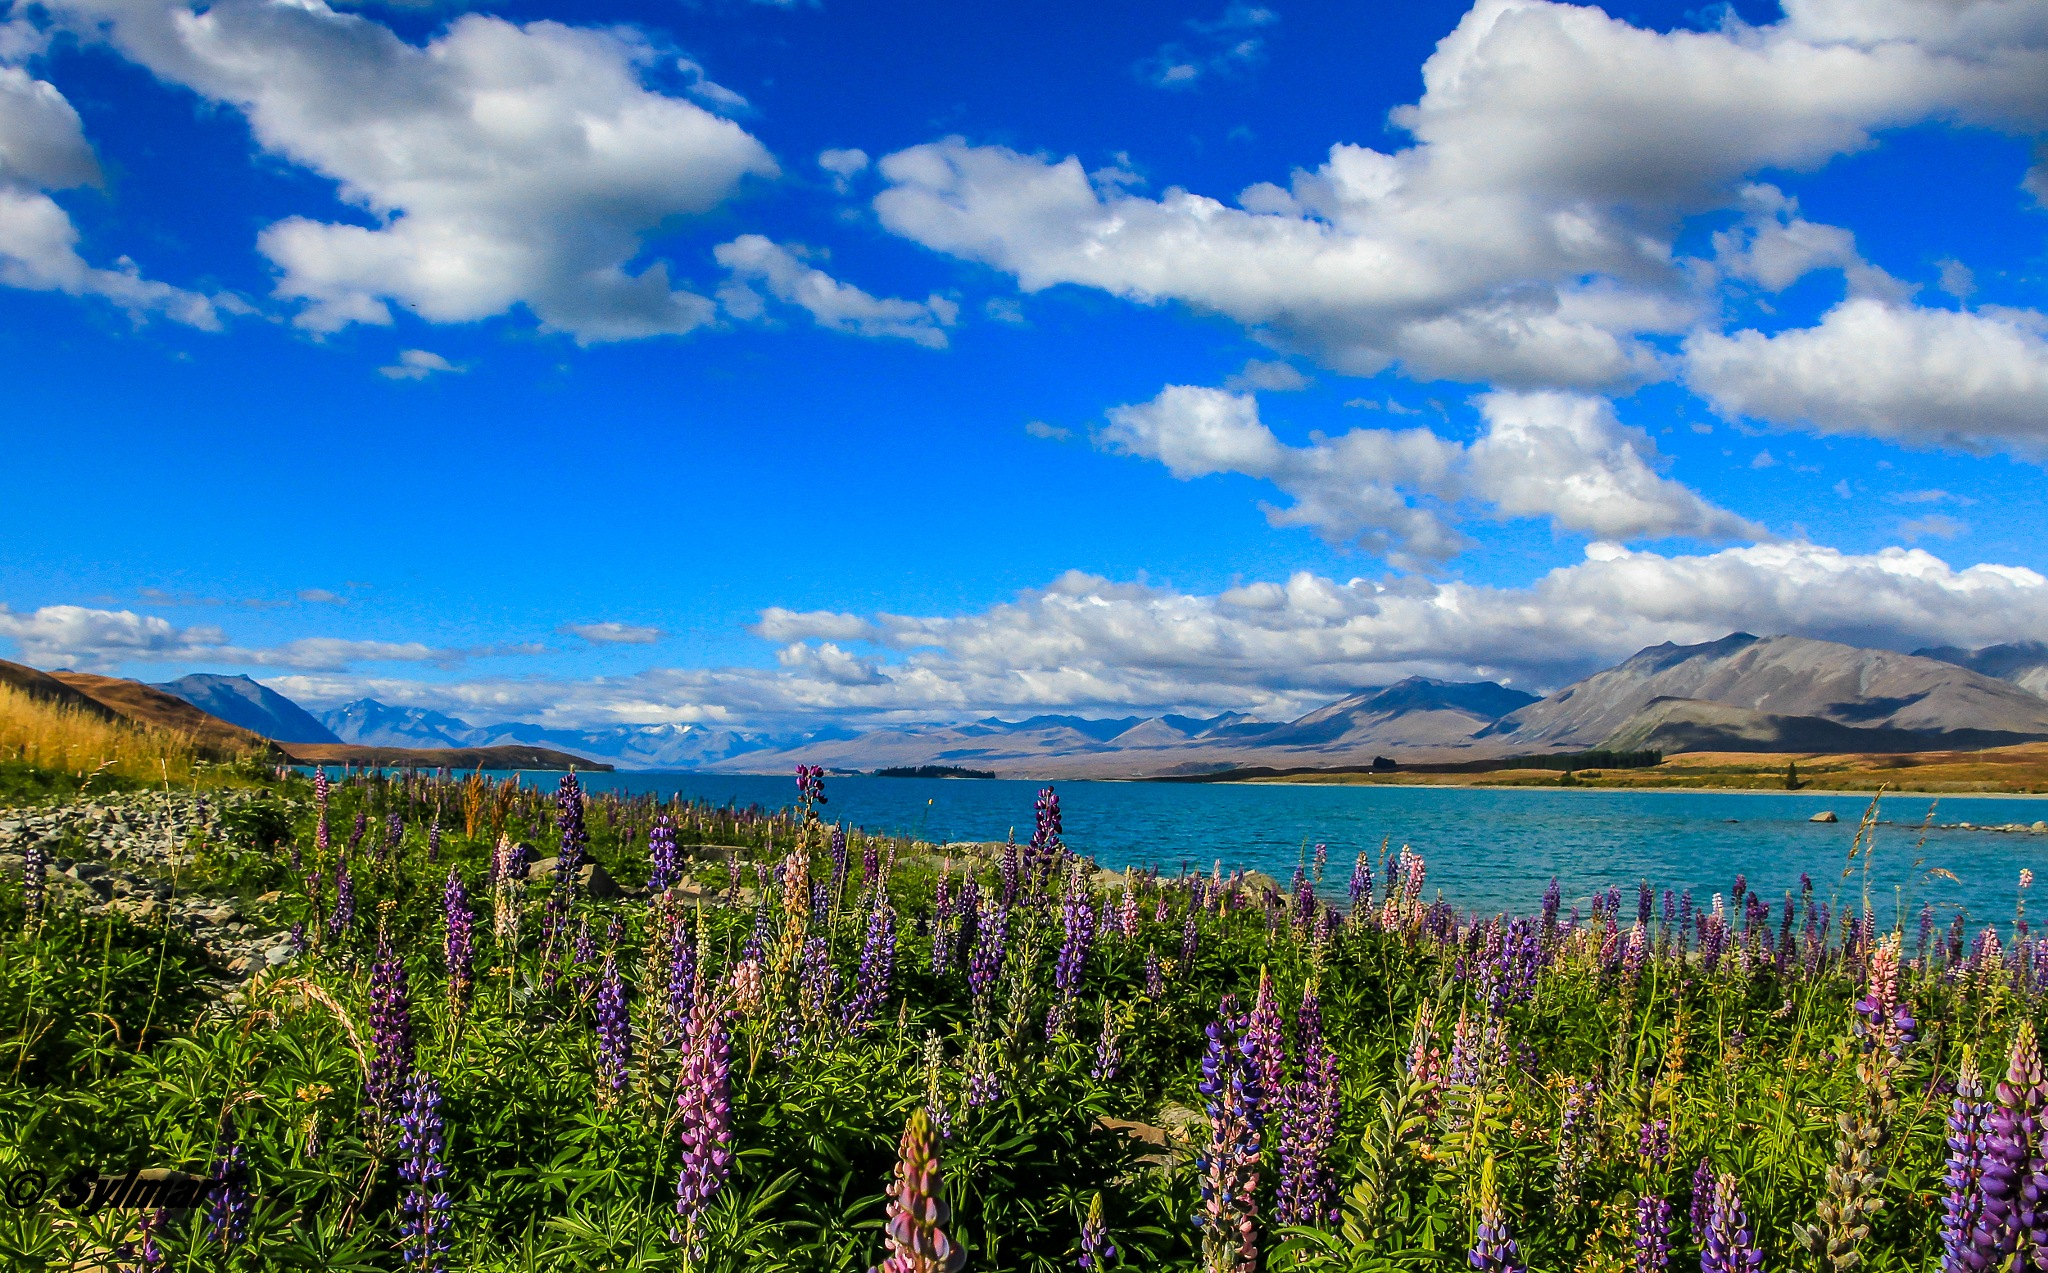 Lake Pukaki, New Zealand by Sylmar